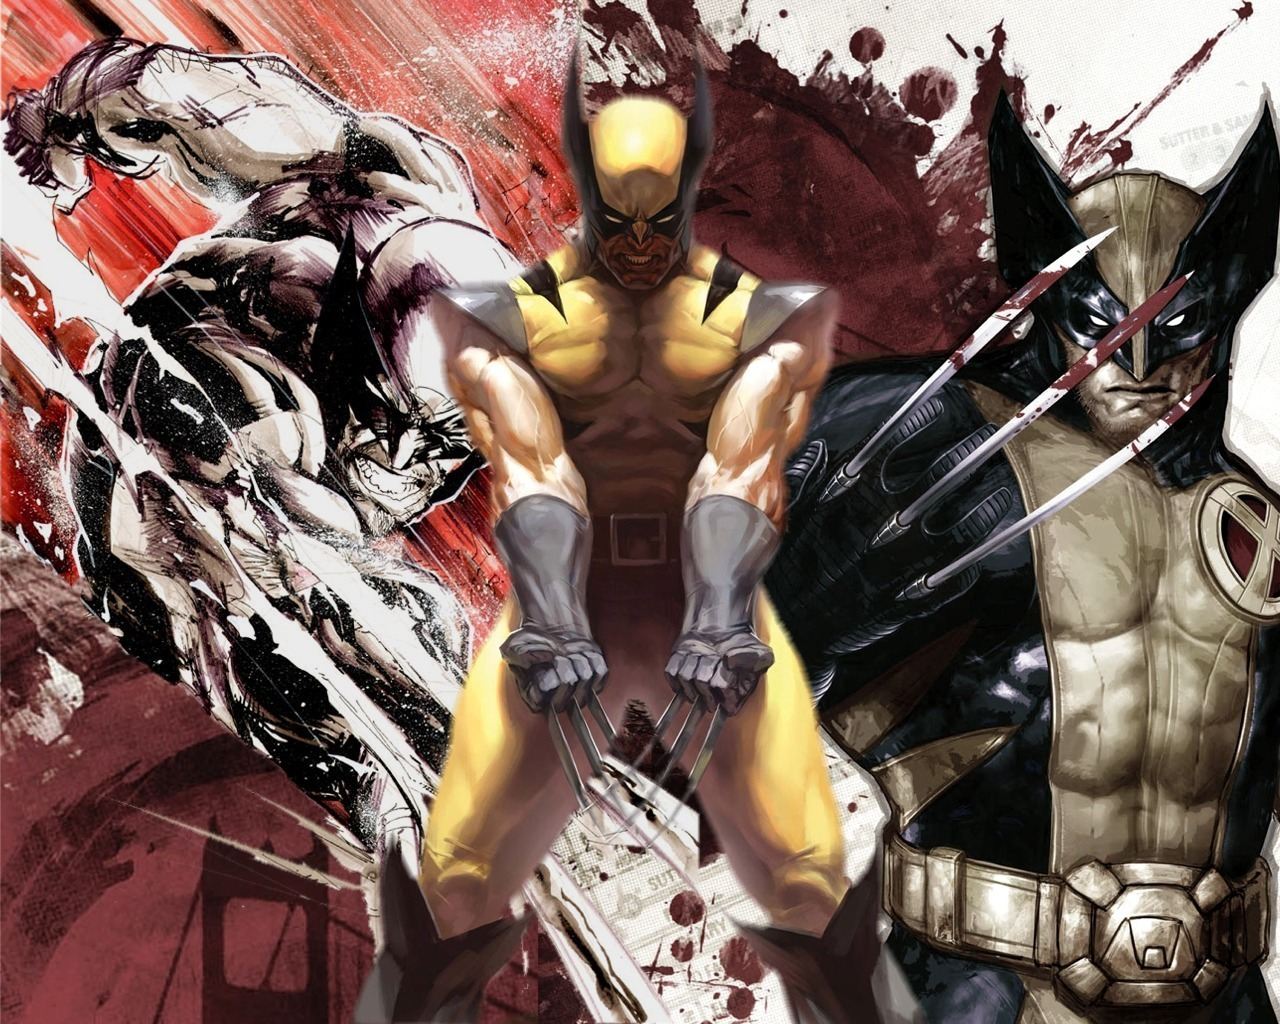 x man wolverine hd wallpaper,fictional character,superhero,cg artwork,fiction,wolverine